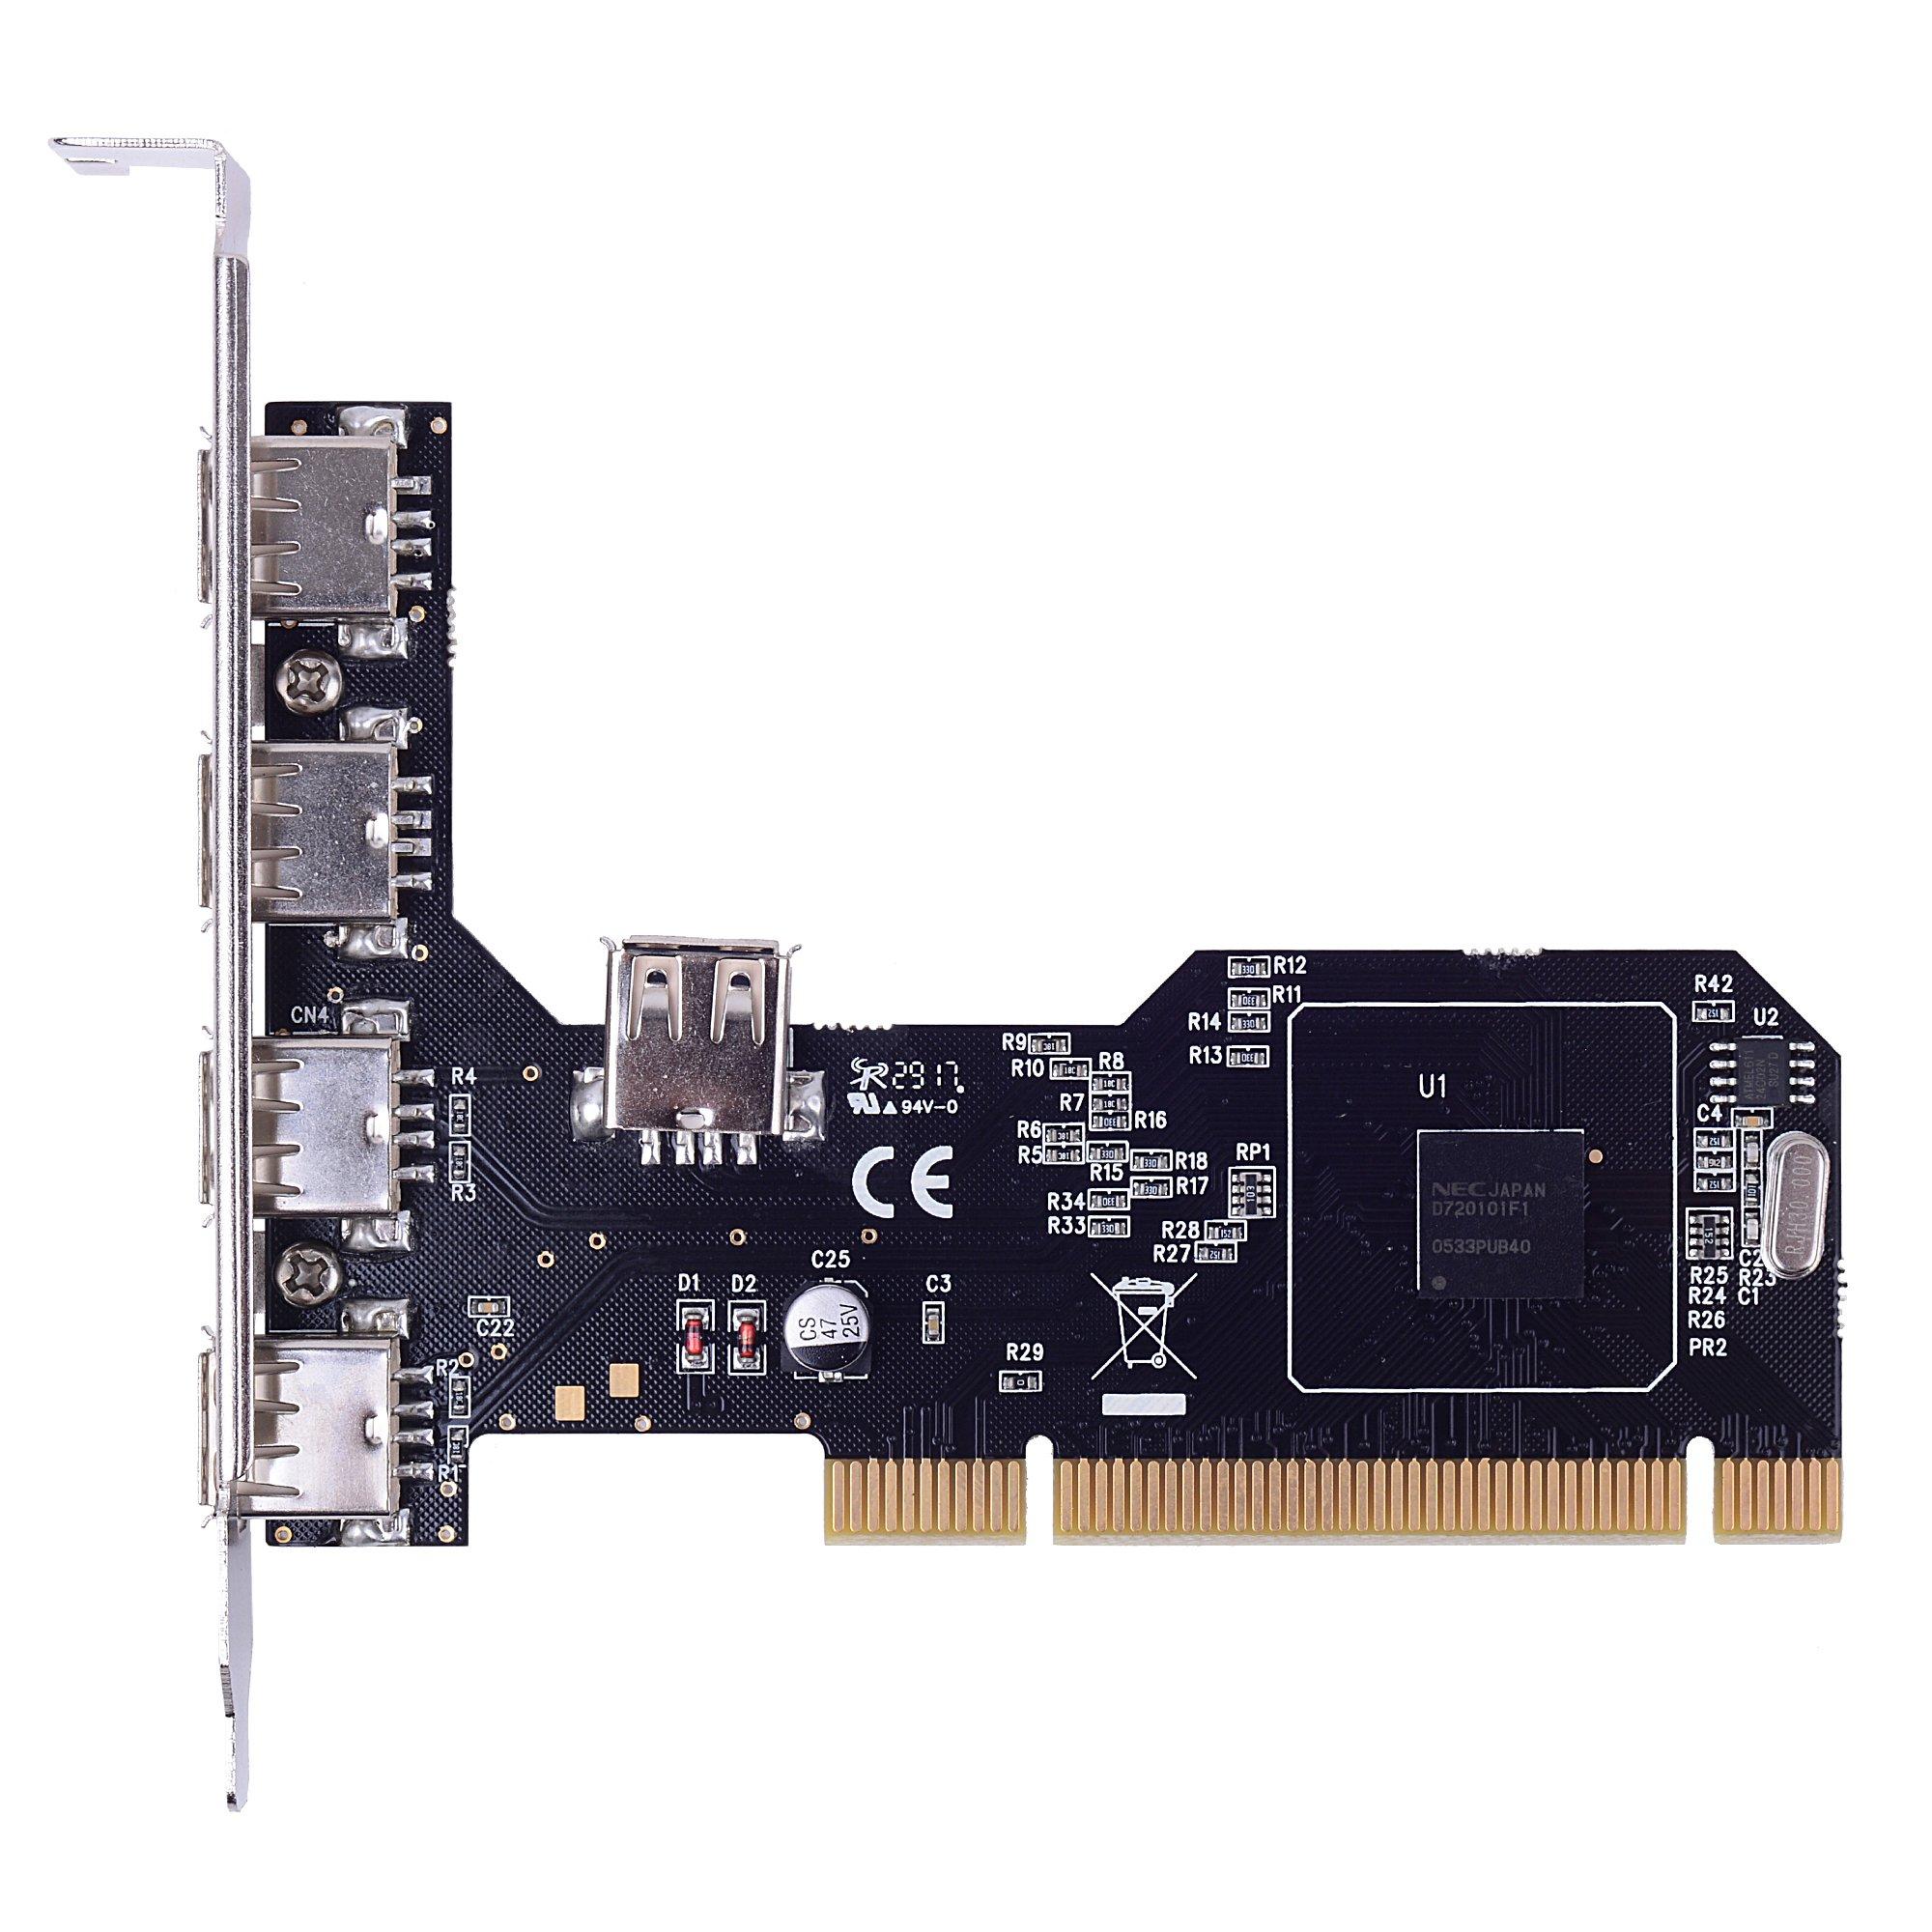 INTEFIRE 5 Port USB 2.0 PCI Expansion Card, 4 External & 1 Internal USB 2 Multi I/O Hub Controller Adapter, PCI Express to USB 2.0 Card for Desktop PC